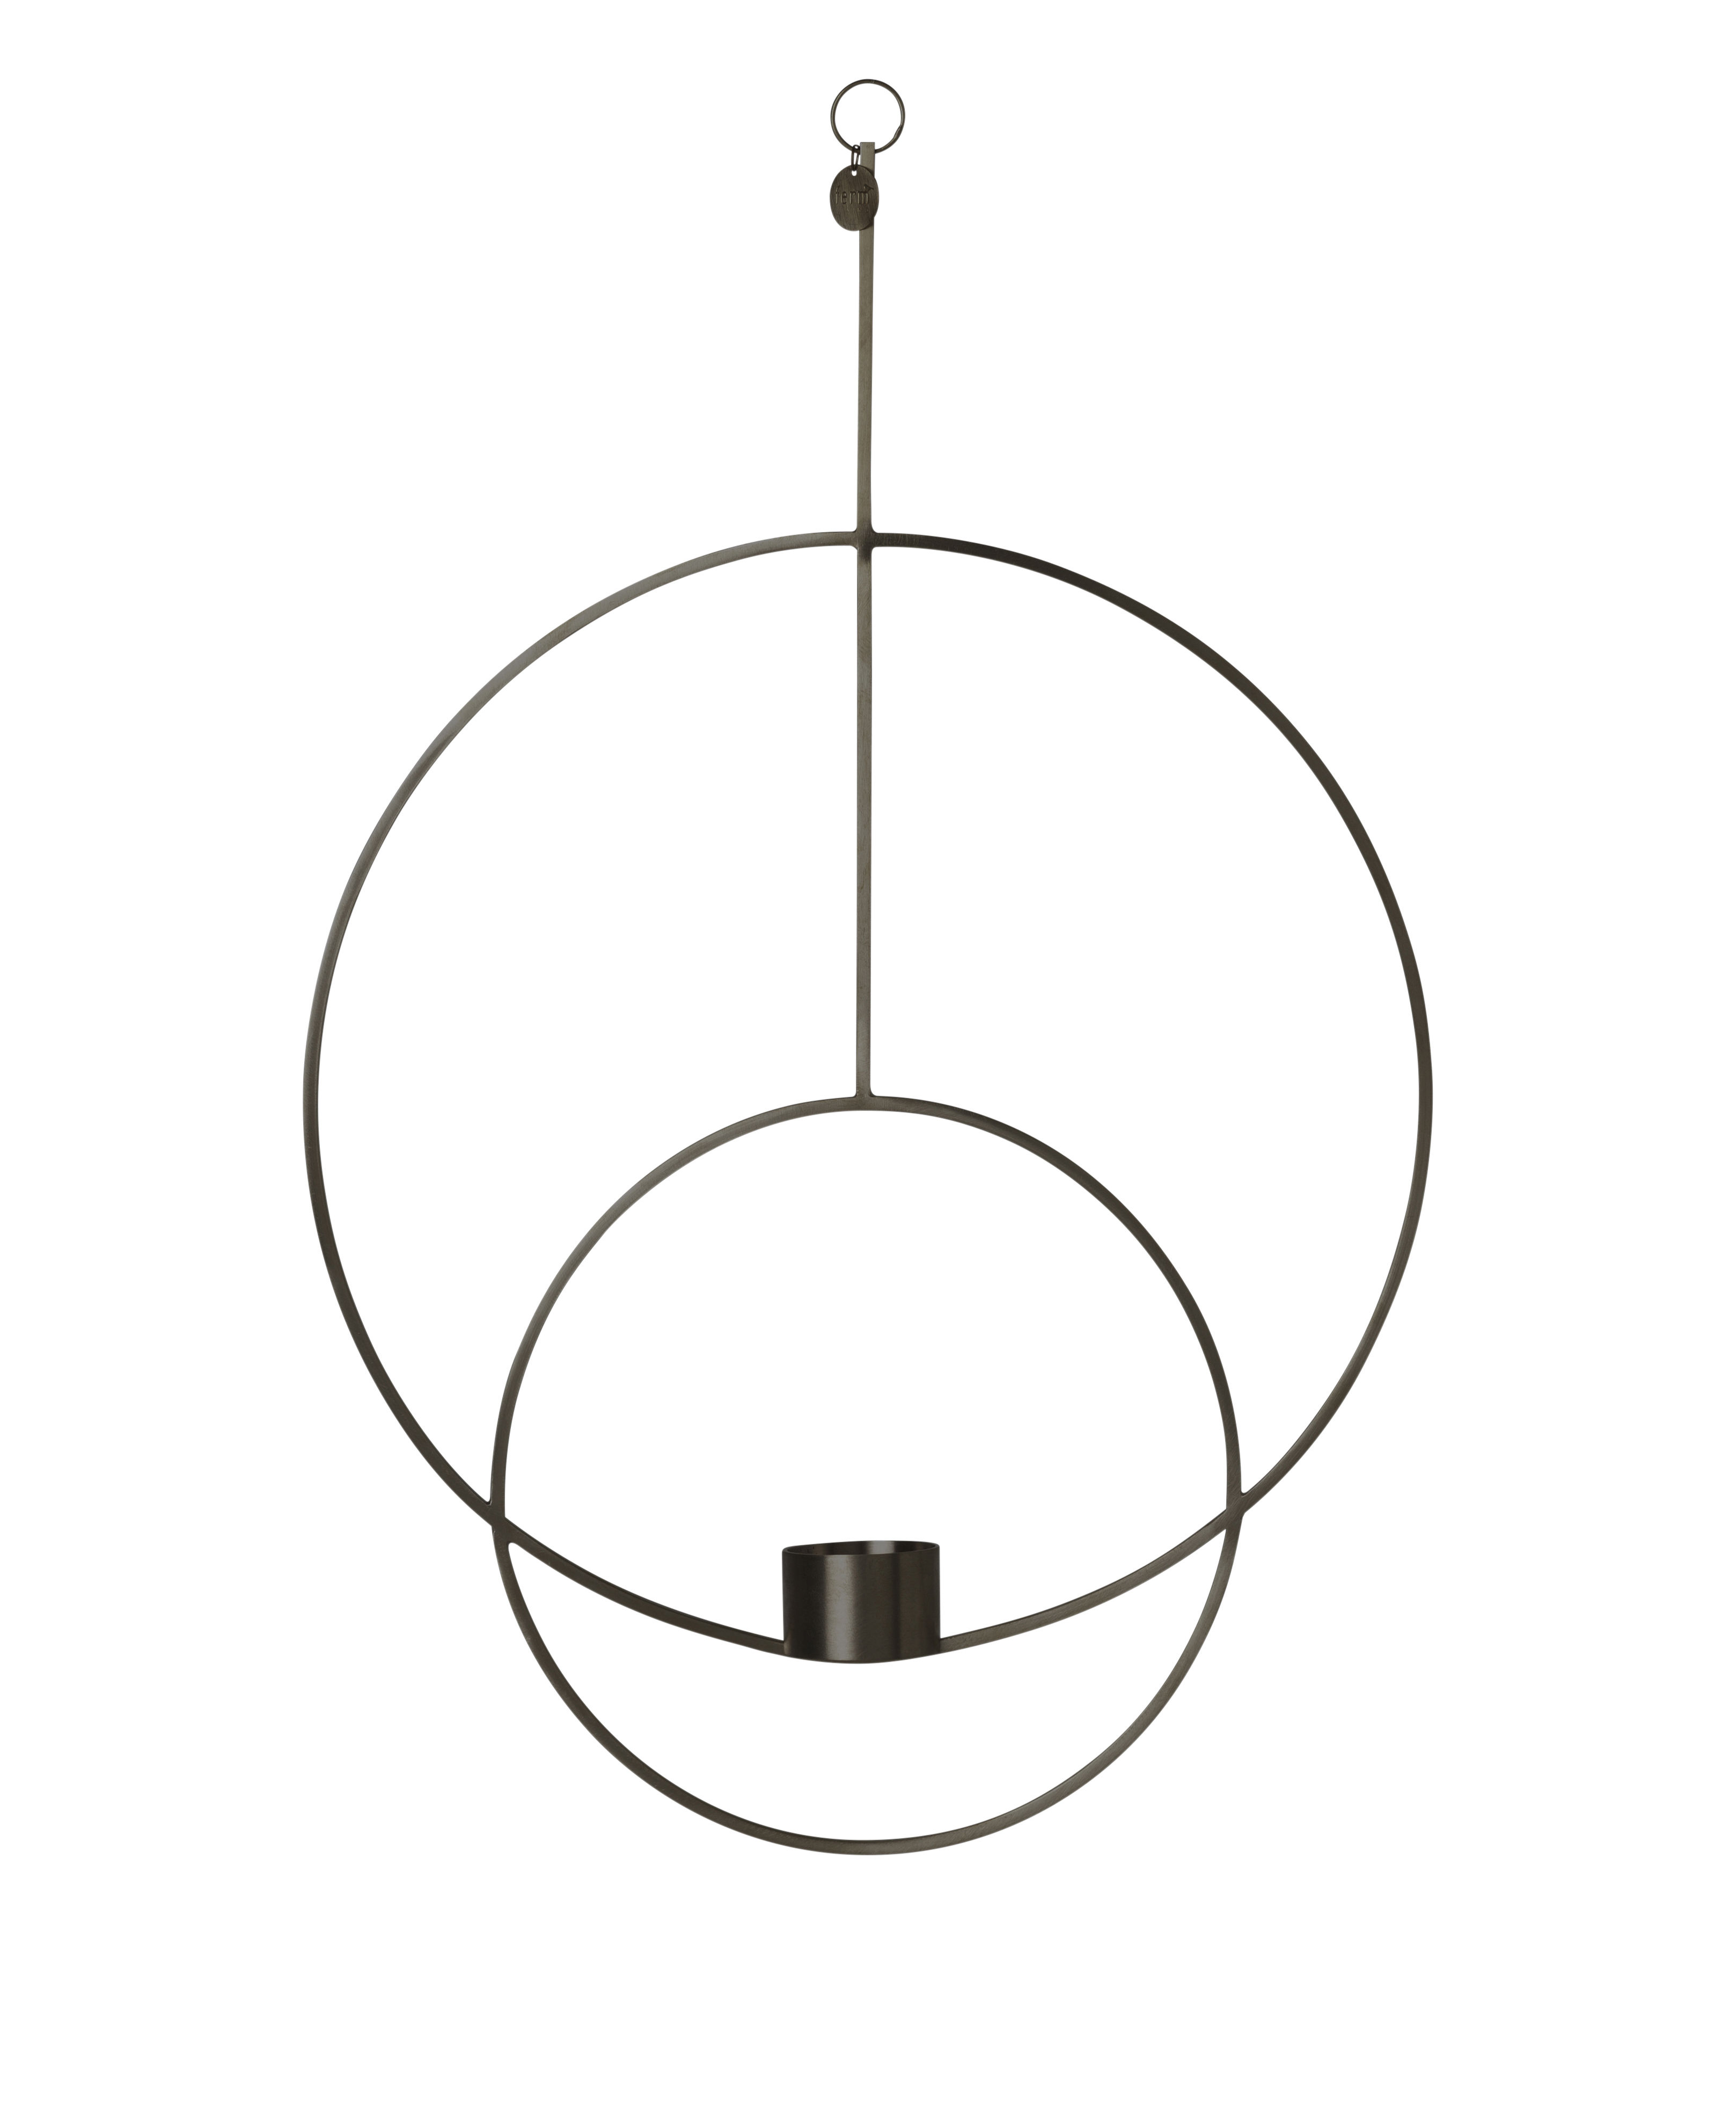 Dekoration - Kerzen, Kerzenleuchter und Windlichter - Circular Kerzenhalter zum Aufhängen / L 30 cm x H 45 cm - Ferm Living - Schwarz - Messing, bemalt